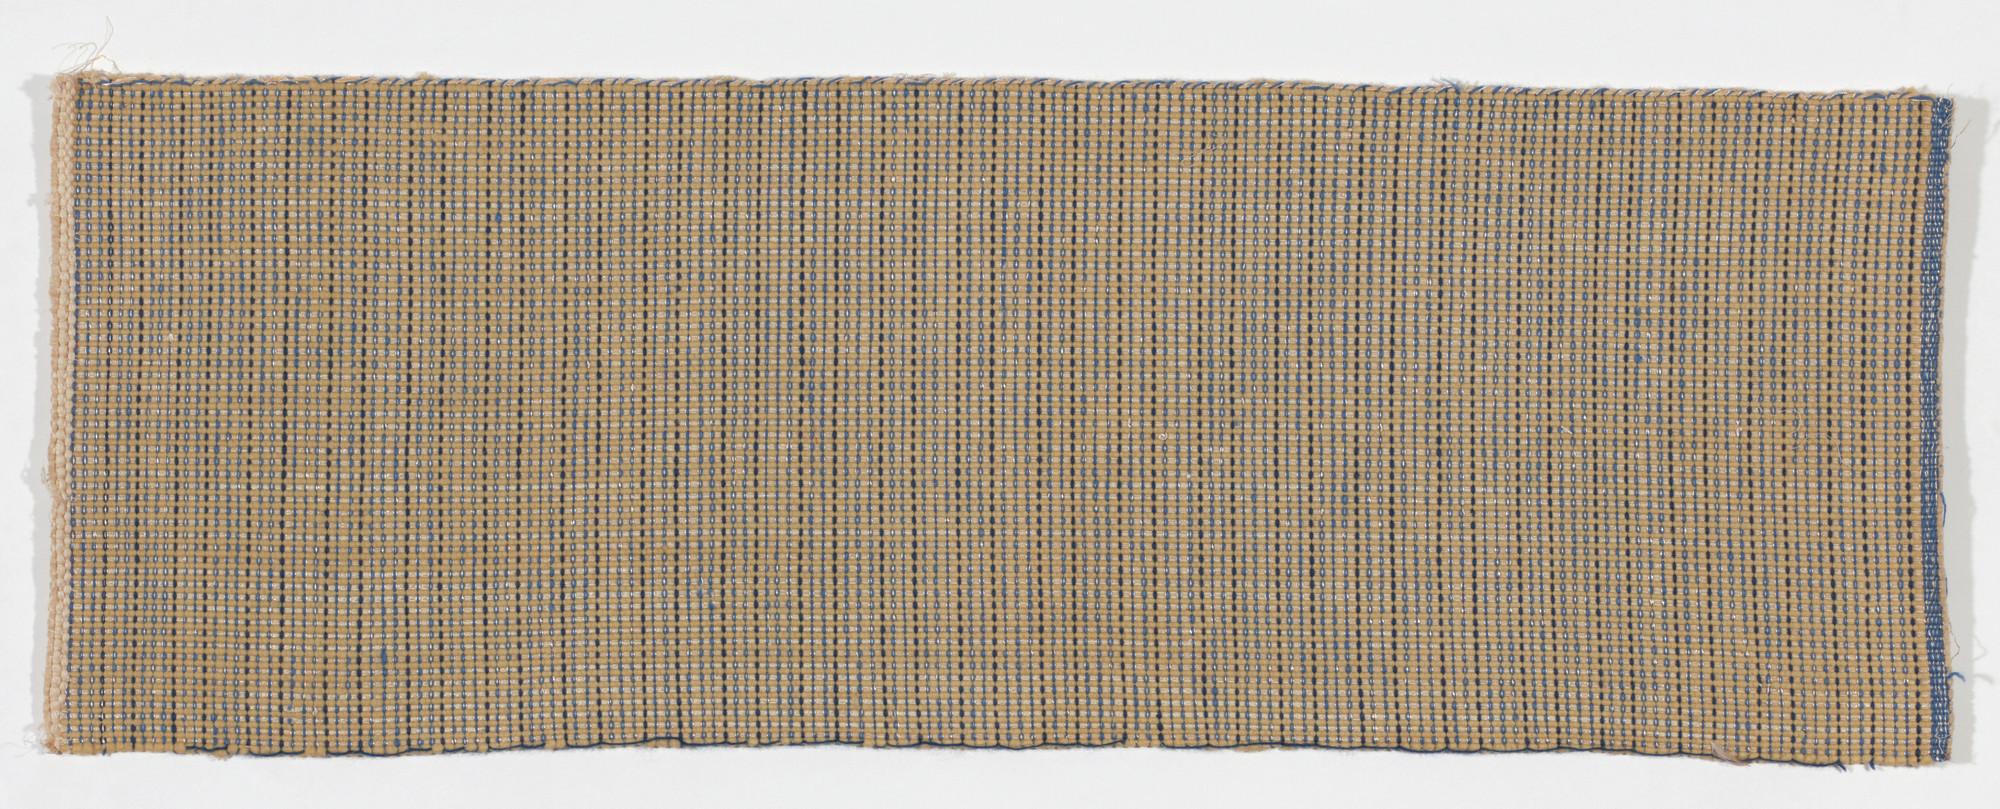 Ulla Af Ugglas Woven Upholstery Fabric